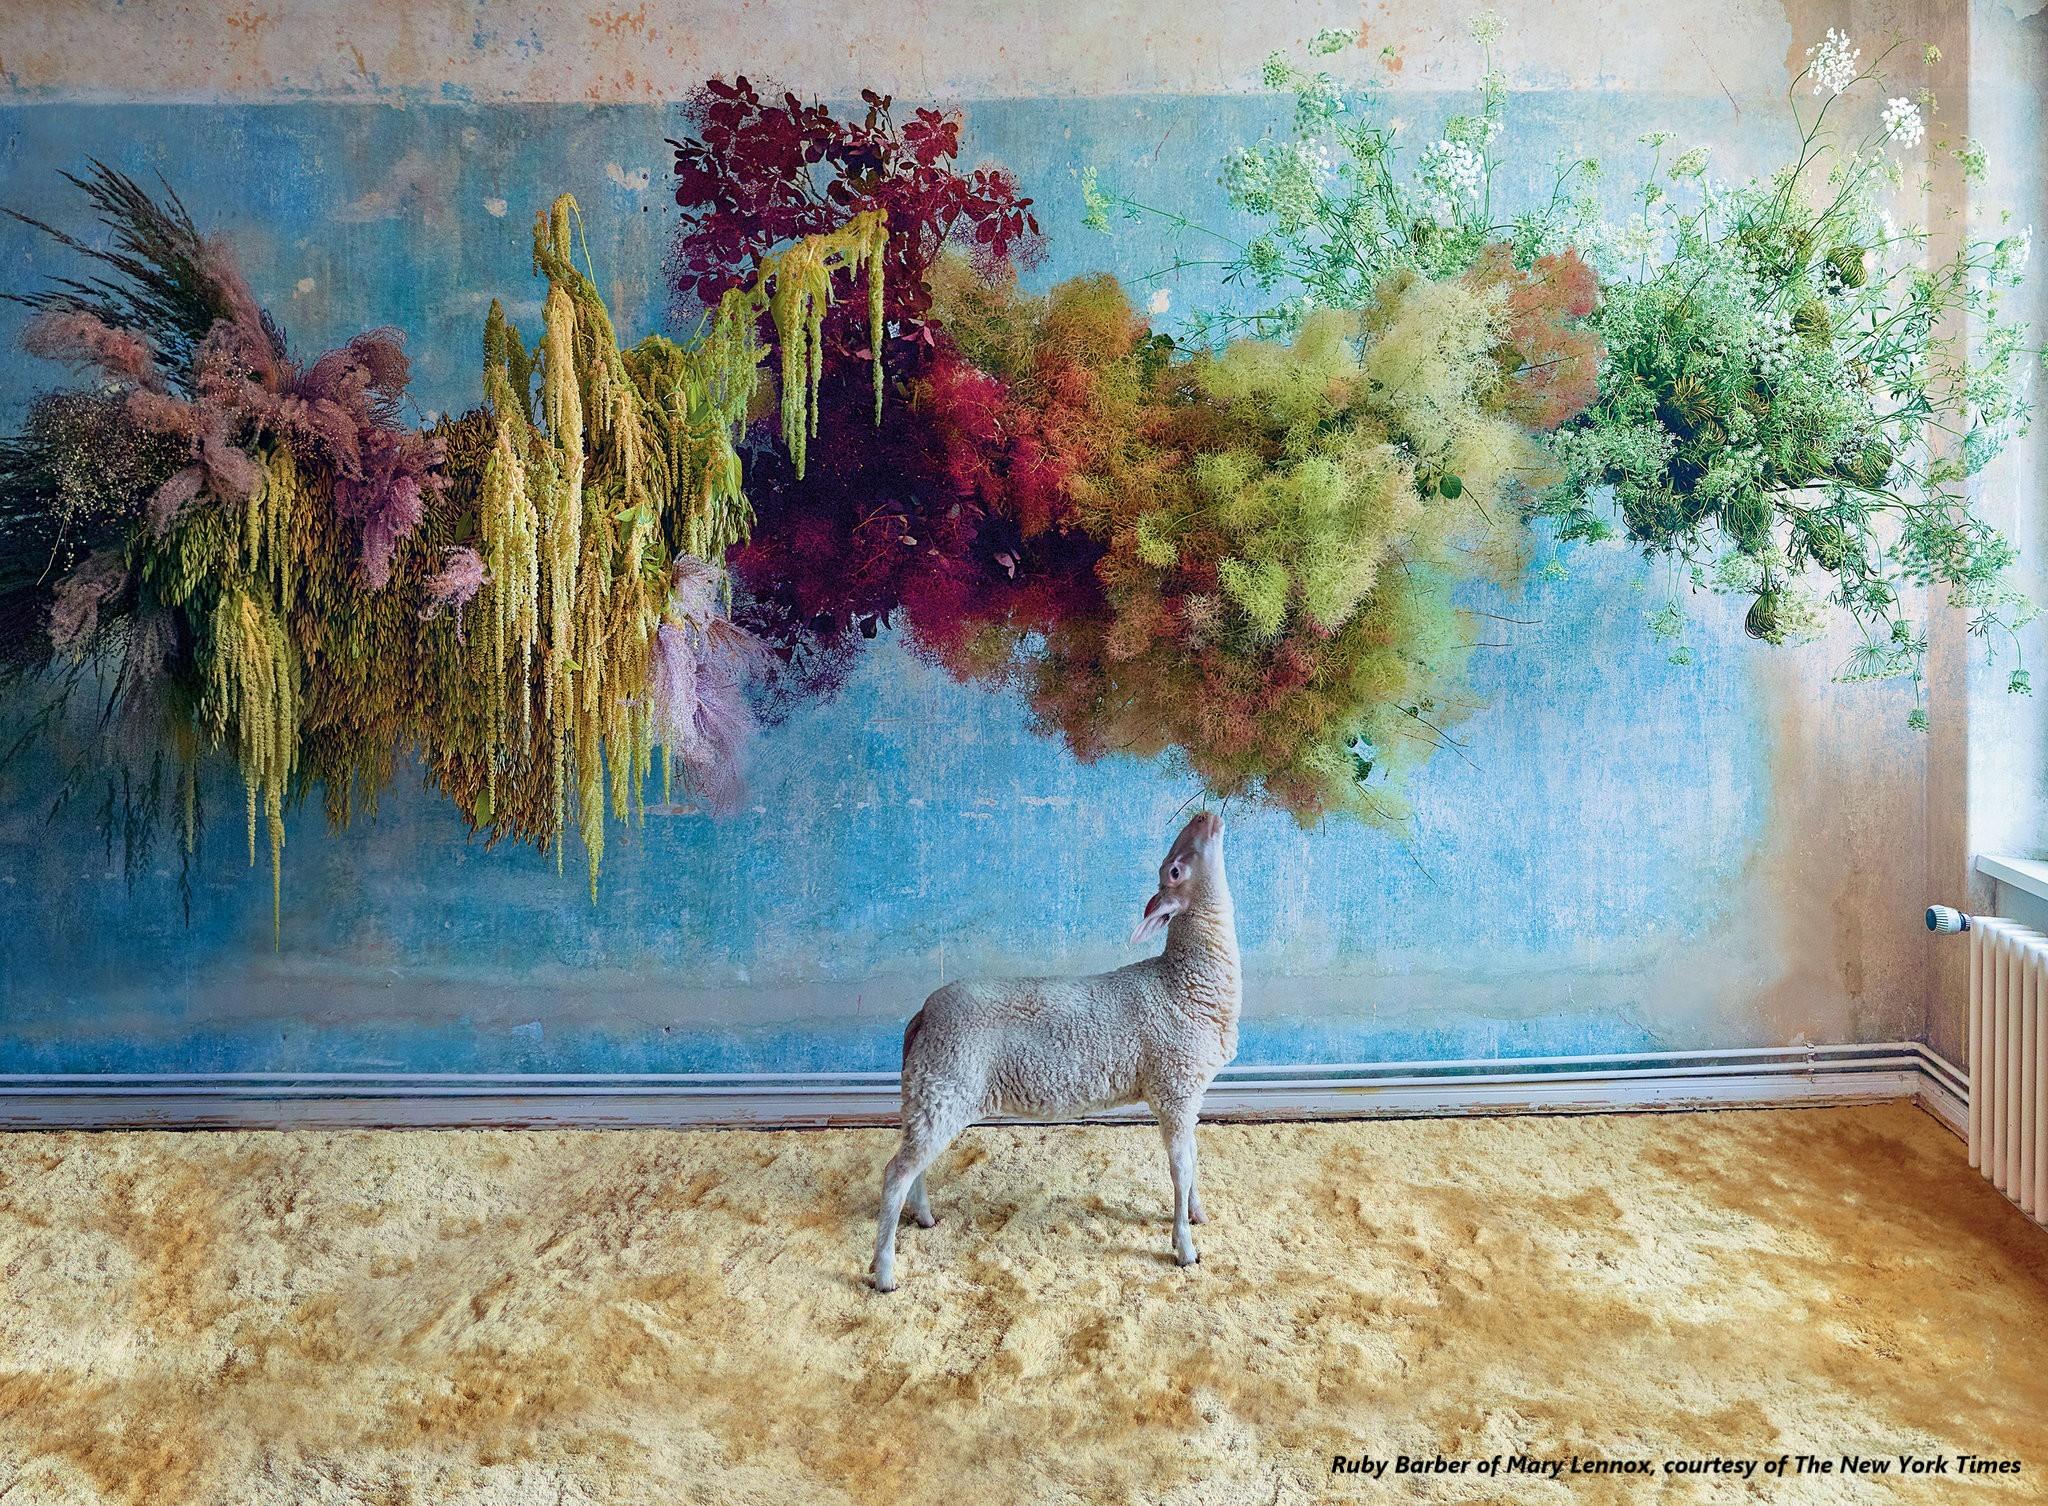 Mary Lennox Art x Indiewalls